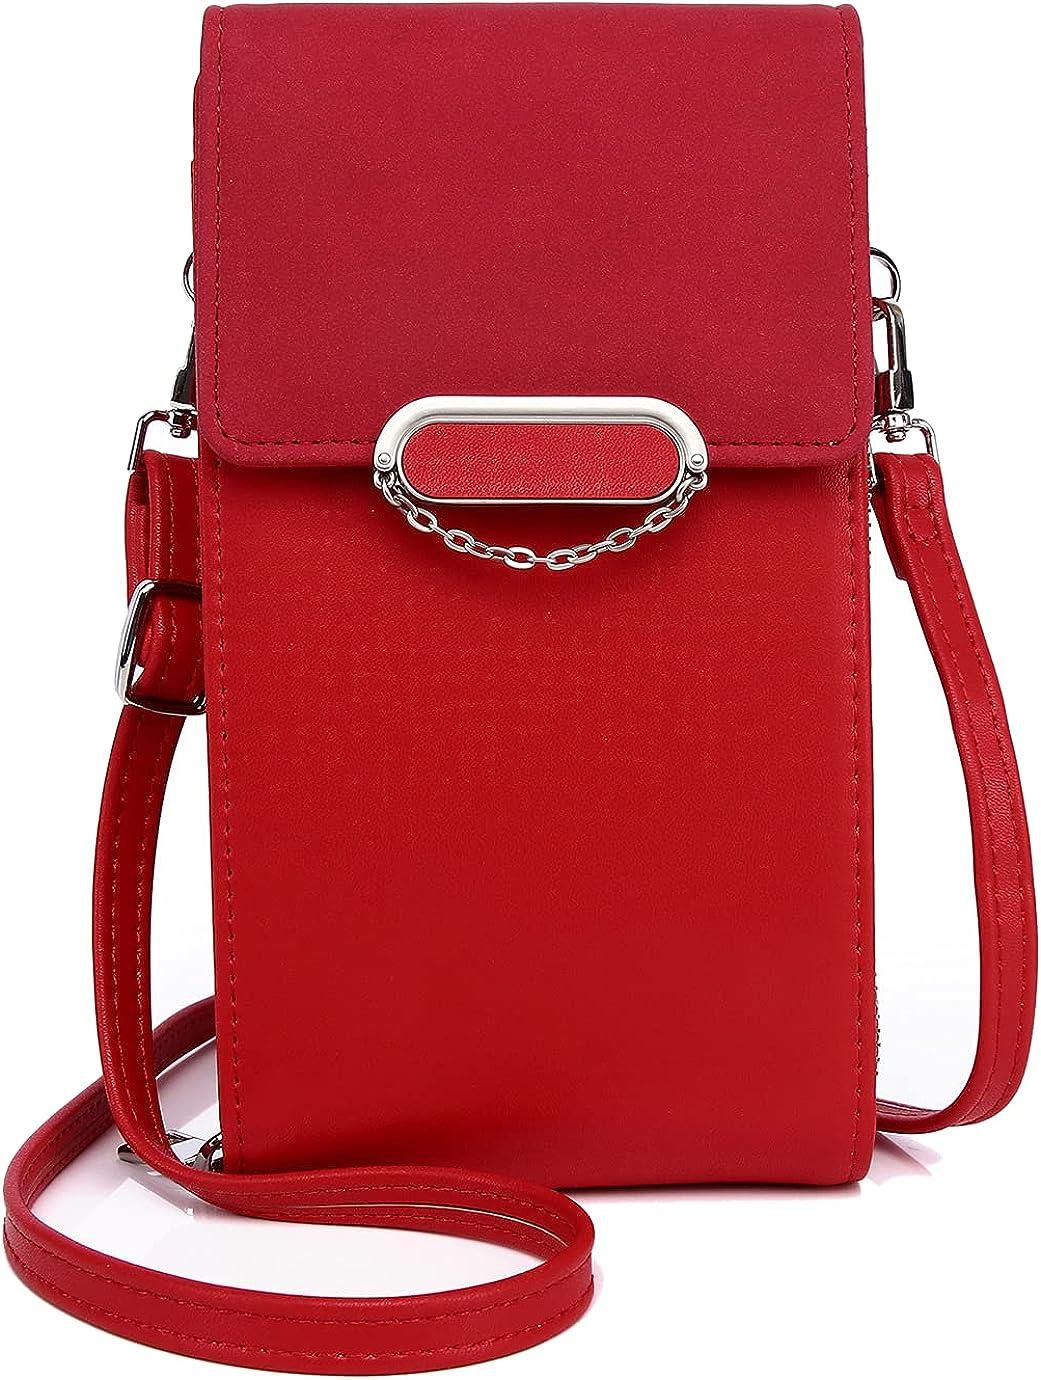 Hanbella Small Shoulder Bags Handbags and Crossbody Purses for Women and Girls